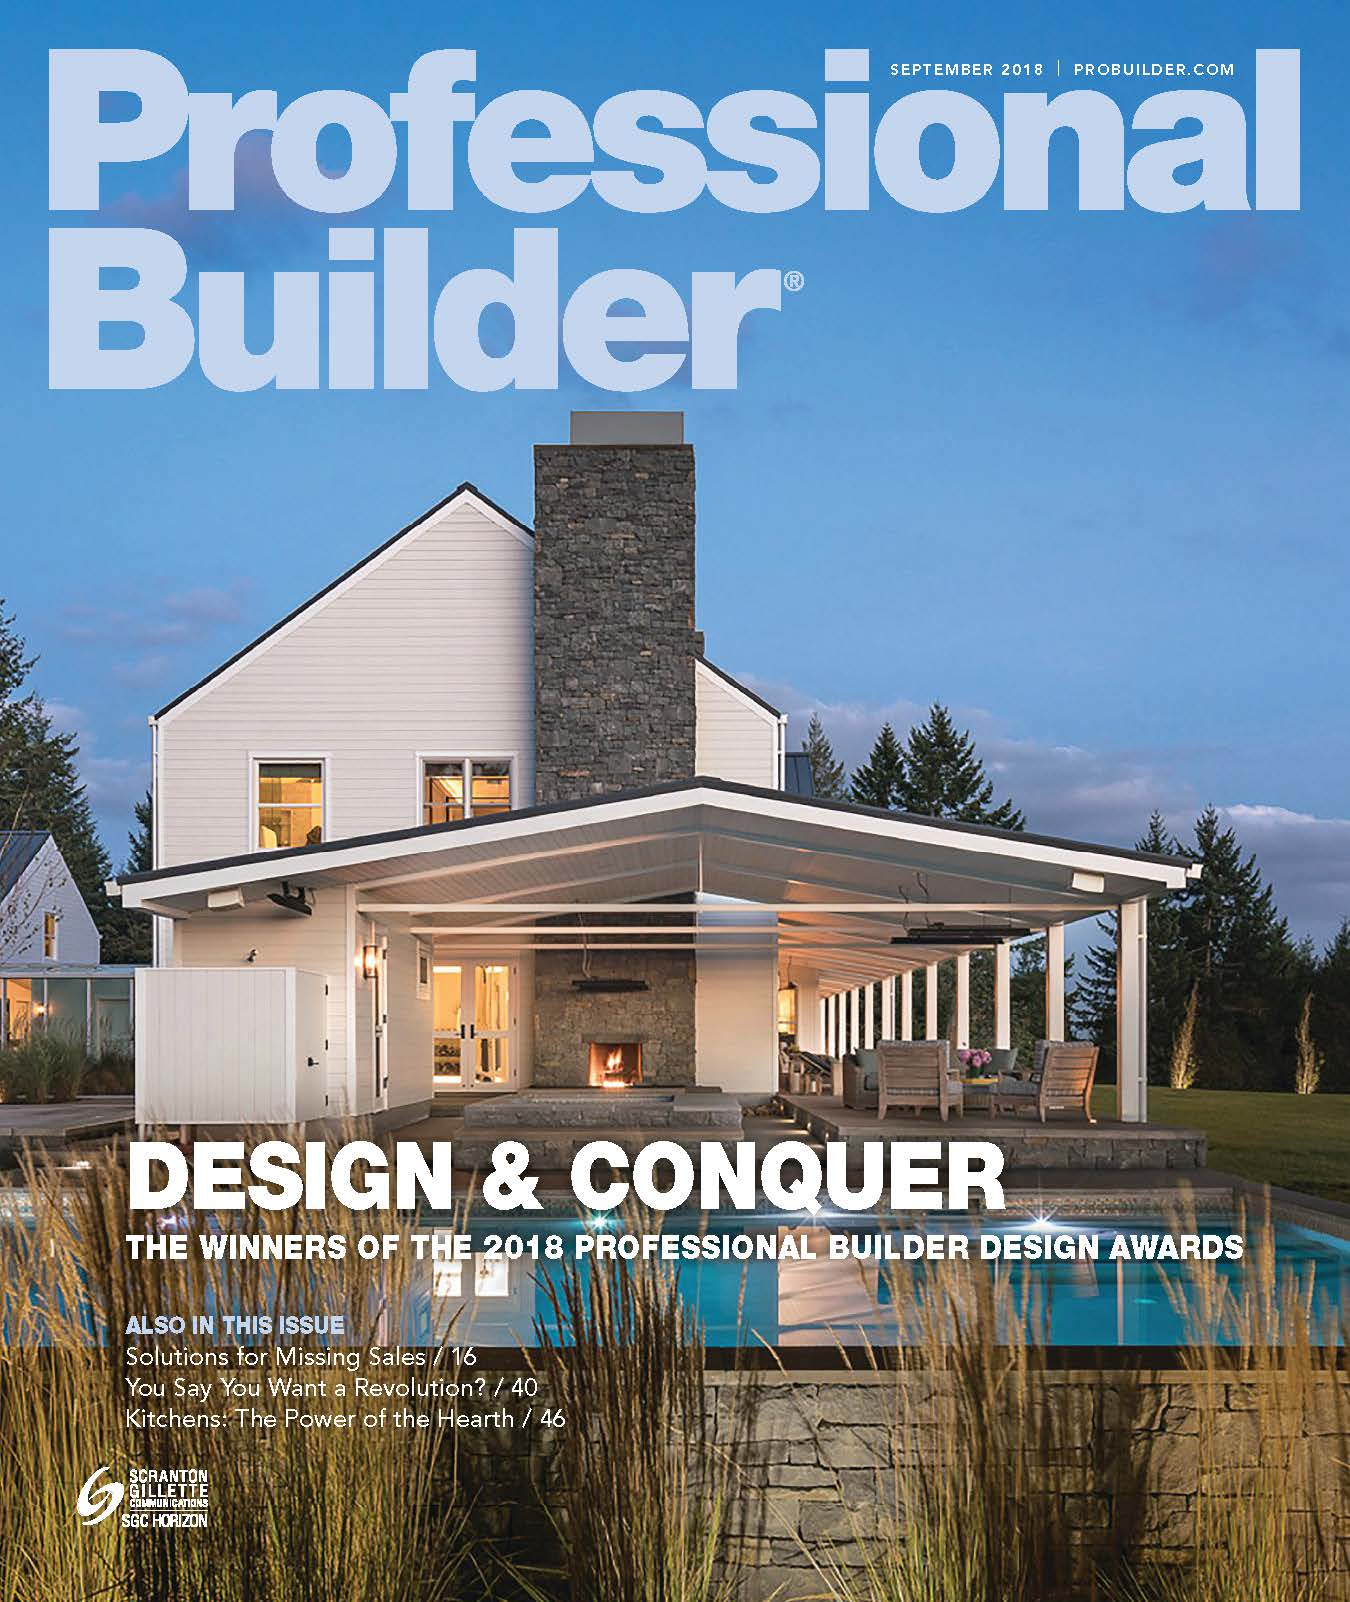 Professional Builder Sept 2018_Page_1.jpg